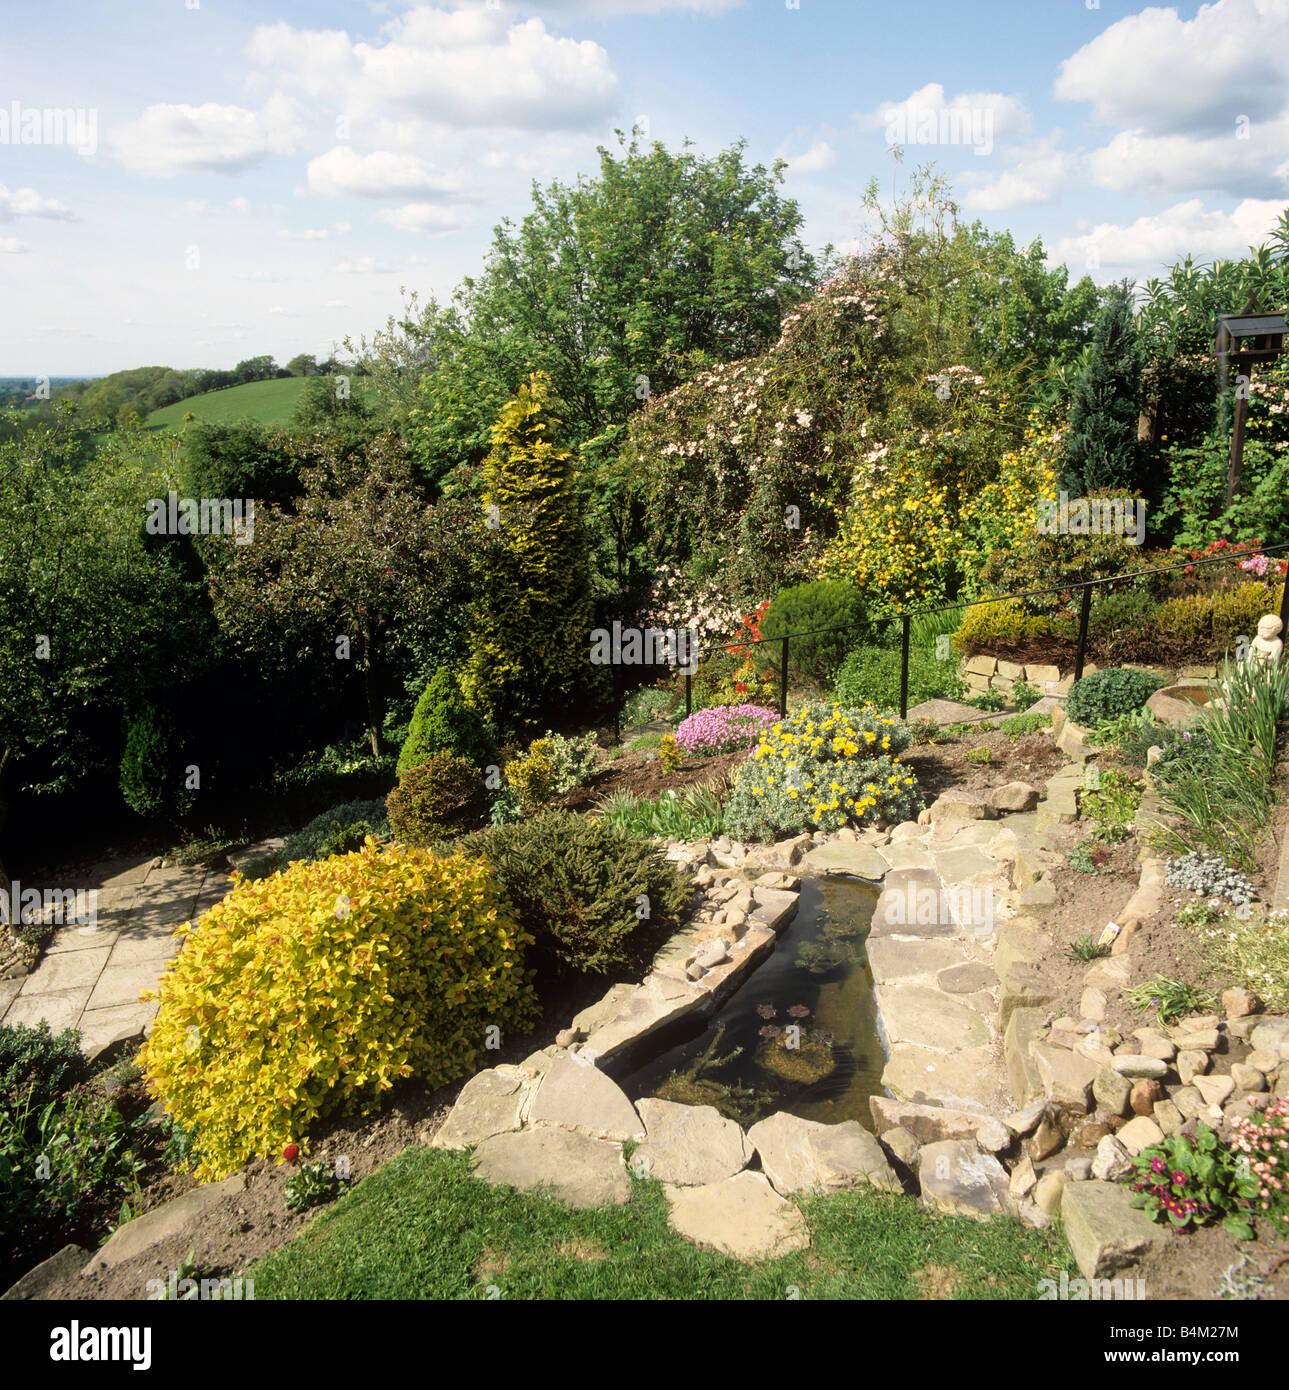 Giardini in pendenza for Soluzioni giardino in pendenza